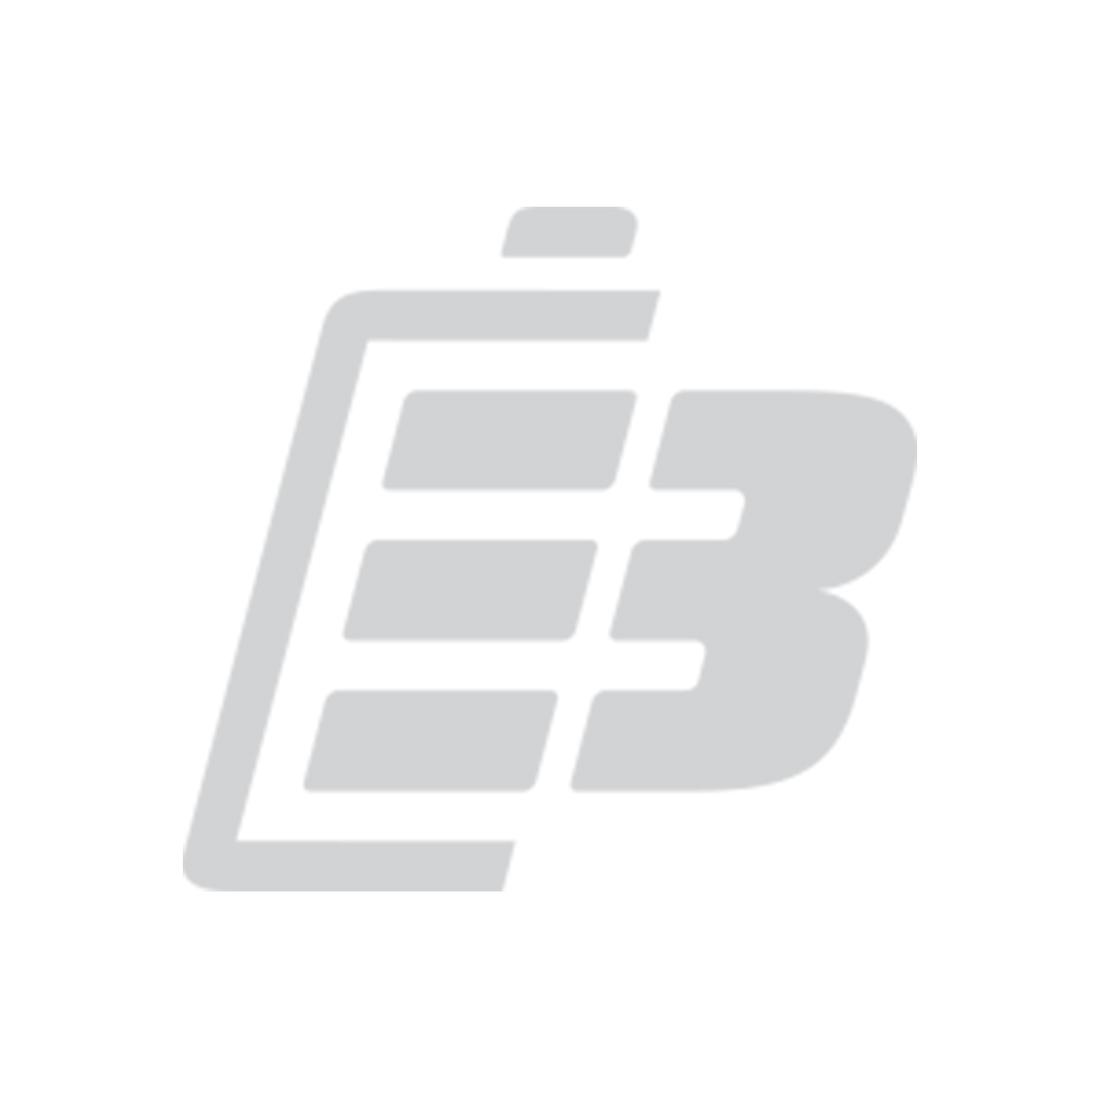 Wireless mouse battery Logitech MX Revolution_1